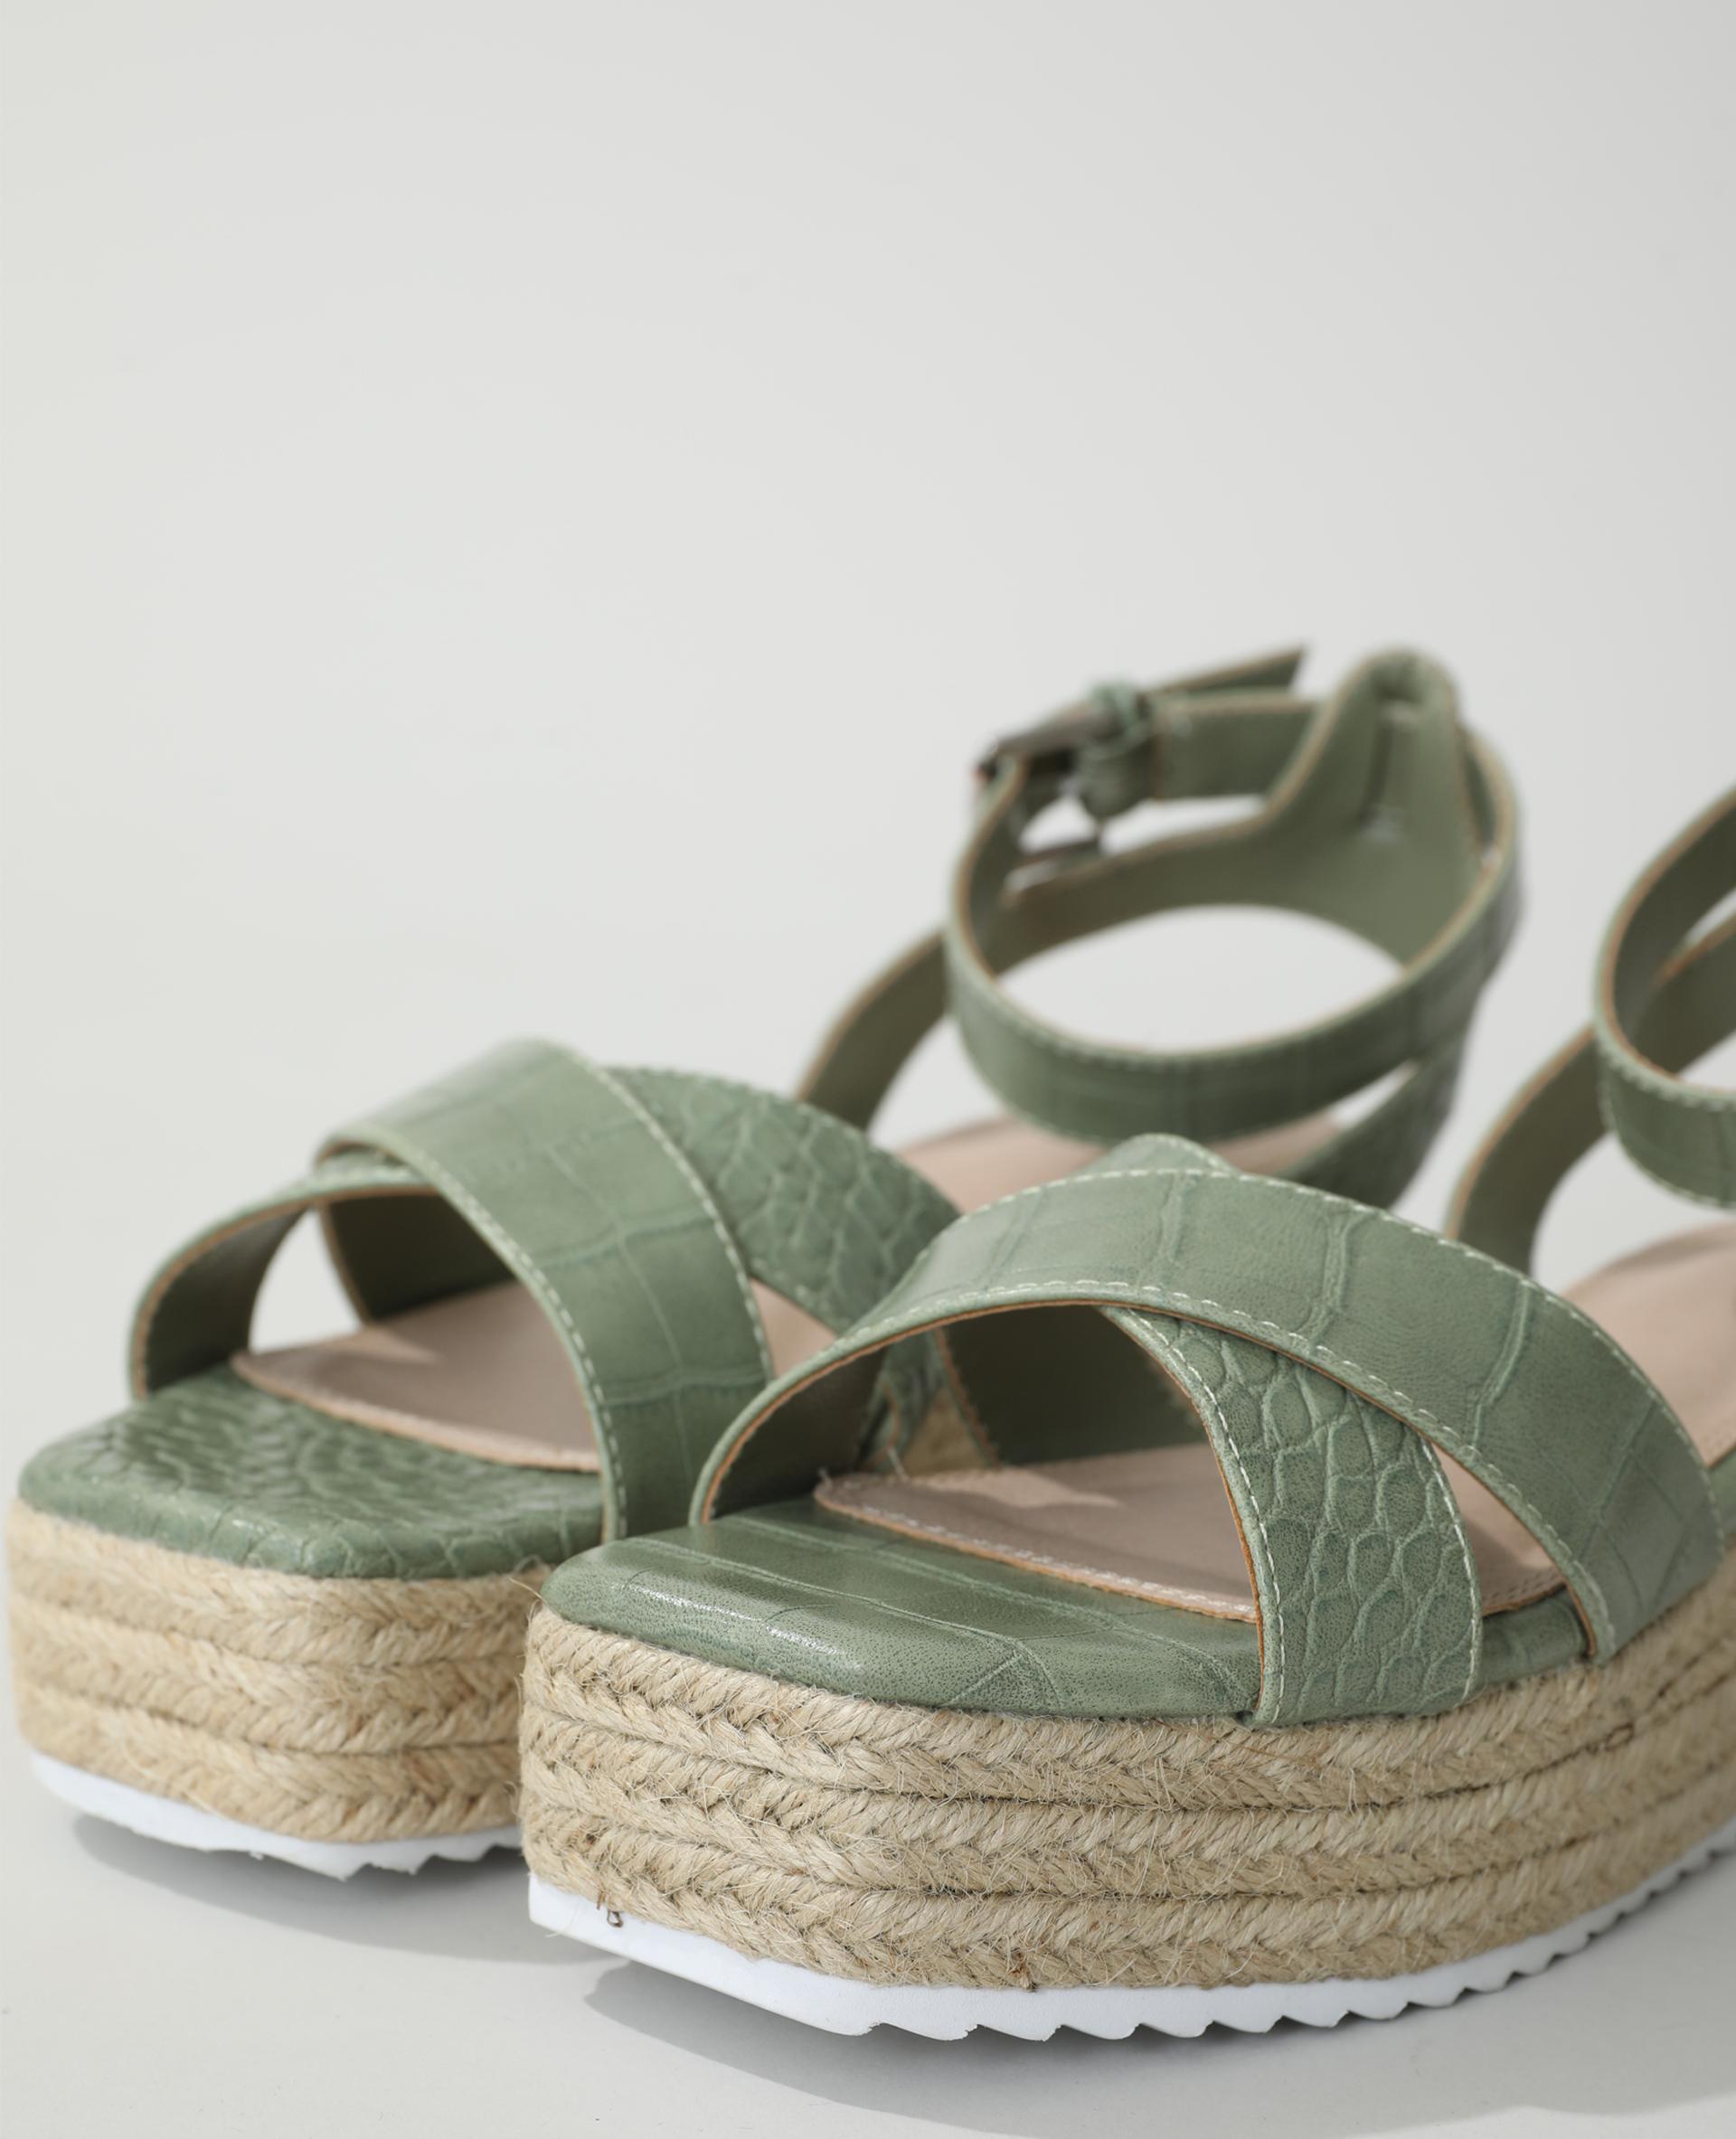 Sandali con zeppa coccodrillo kaki - Pimkie